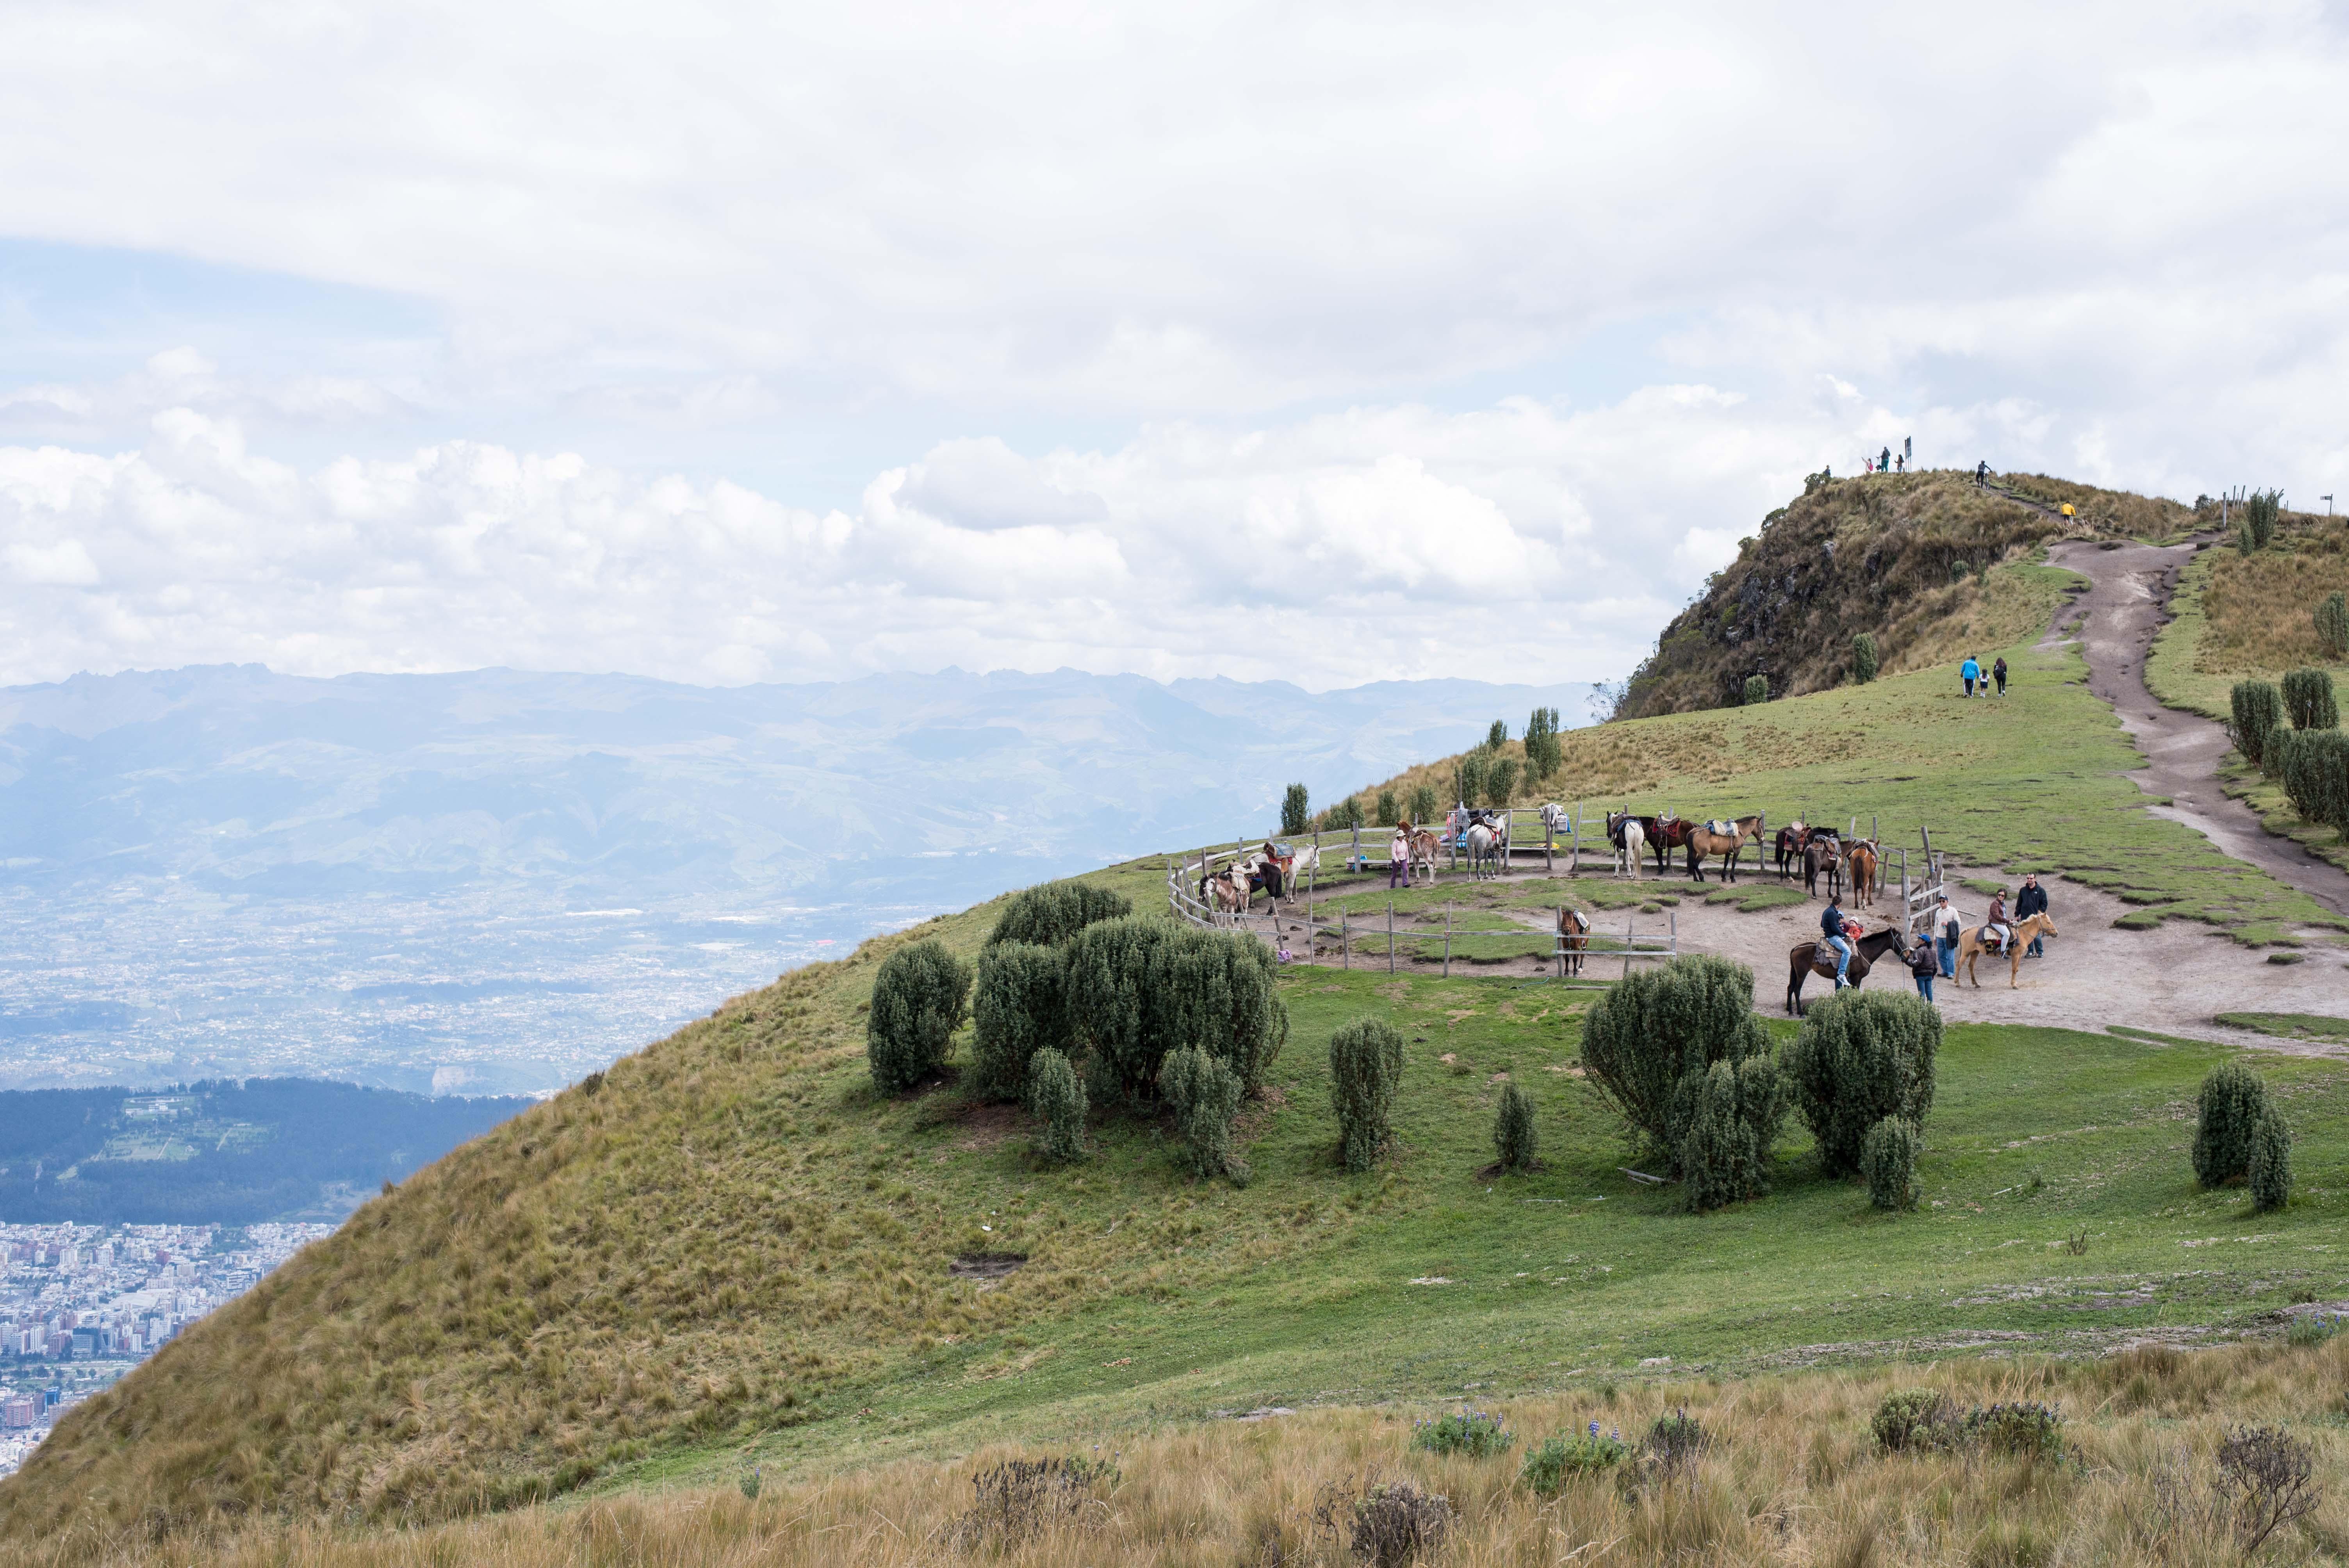 Quito Travel Guide - Pichincha Volcano Hike